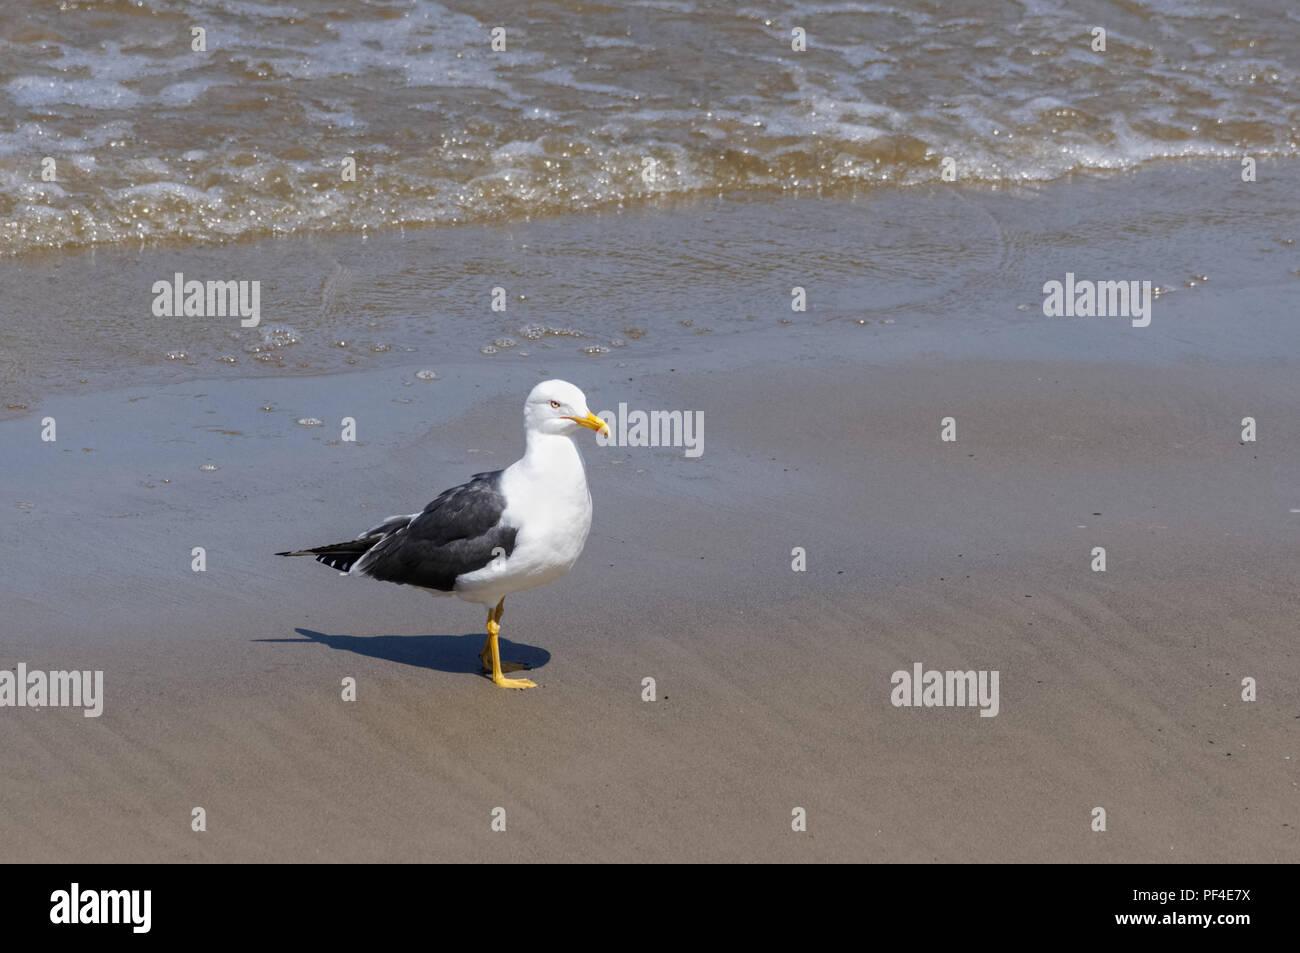 Seagull on the River Thames, London England United Kingdom UK - Stock Image